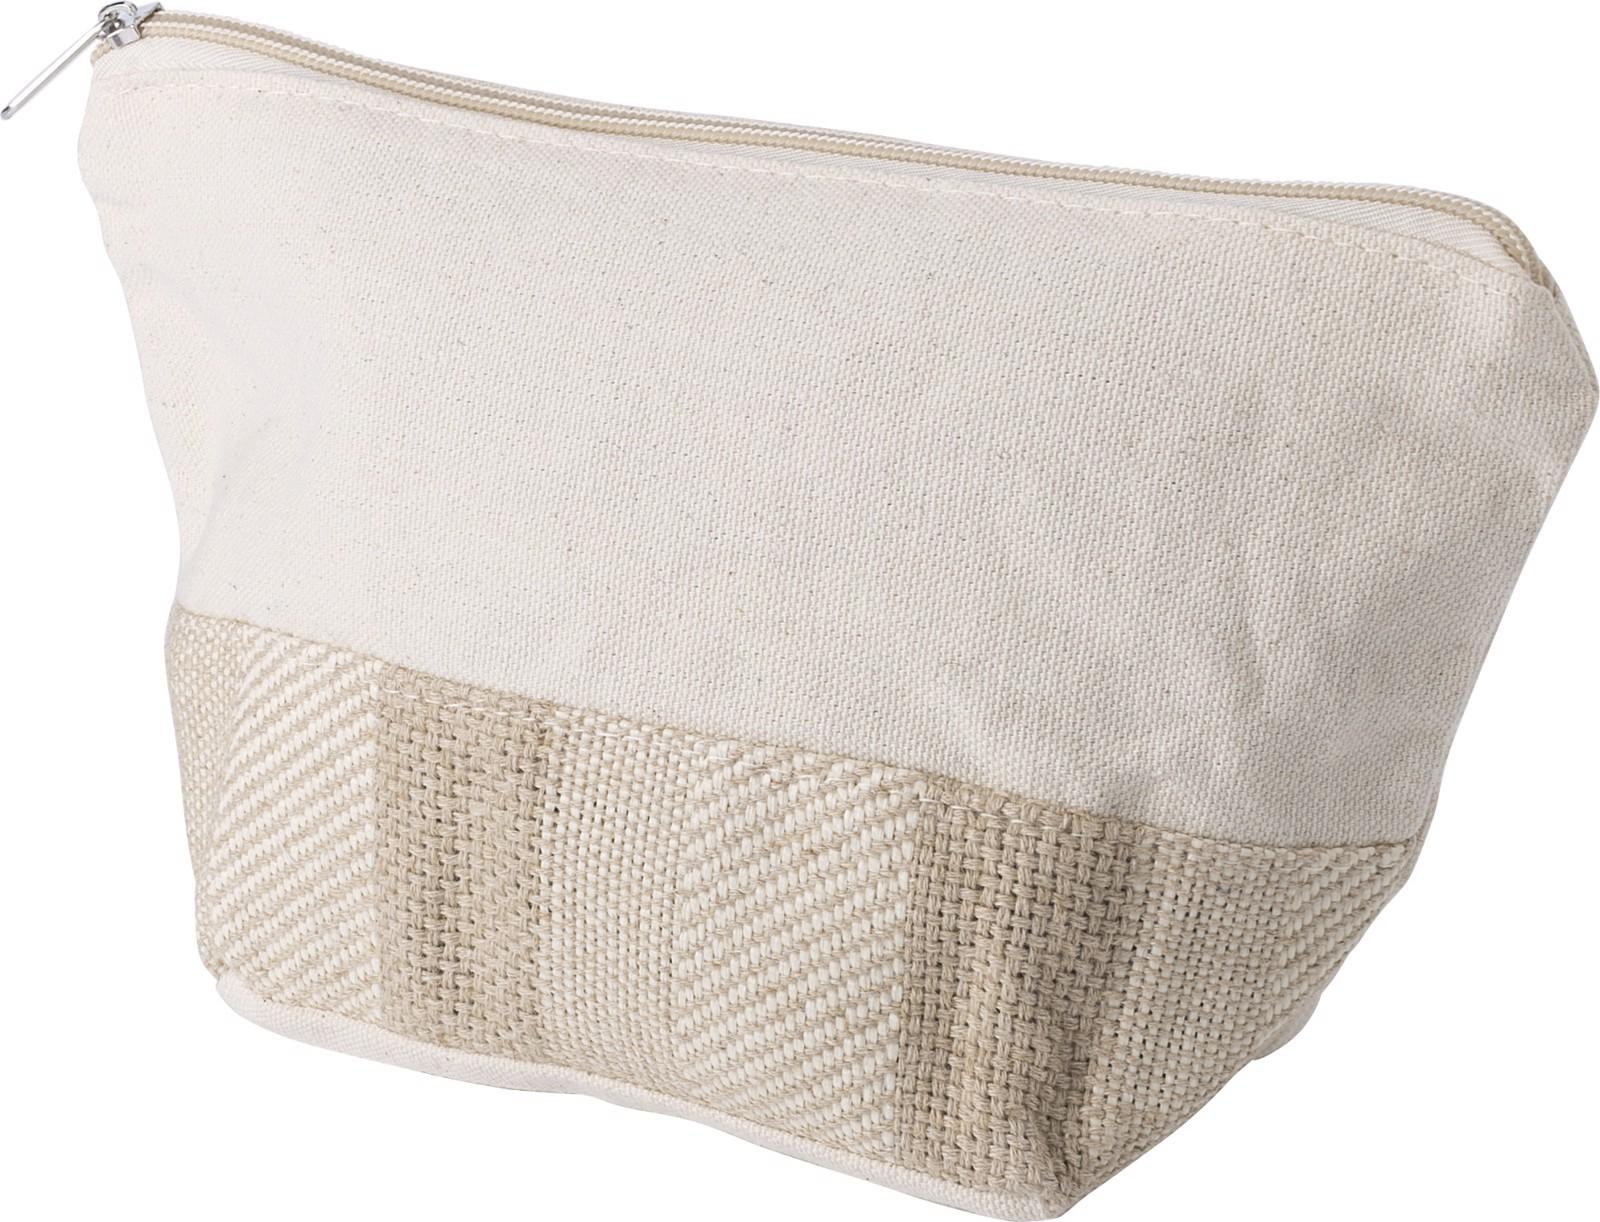 Cotton toiletry bag